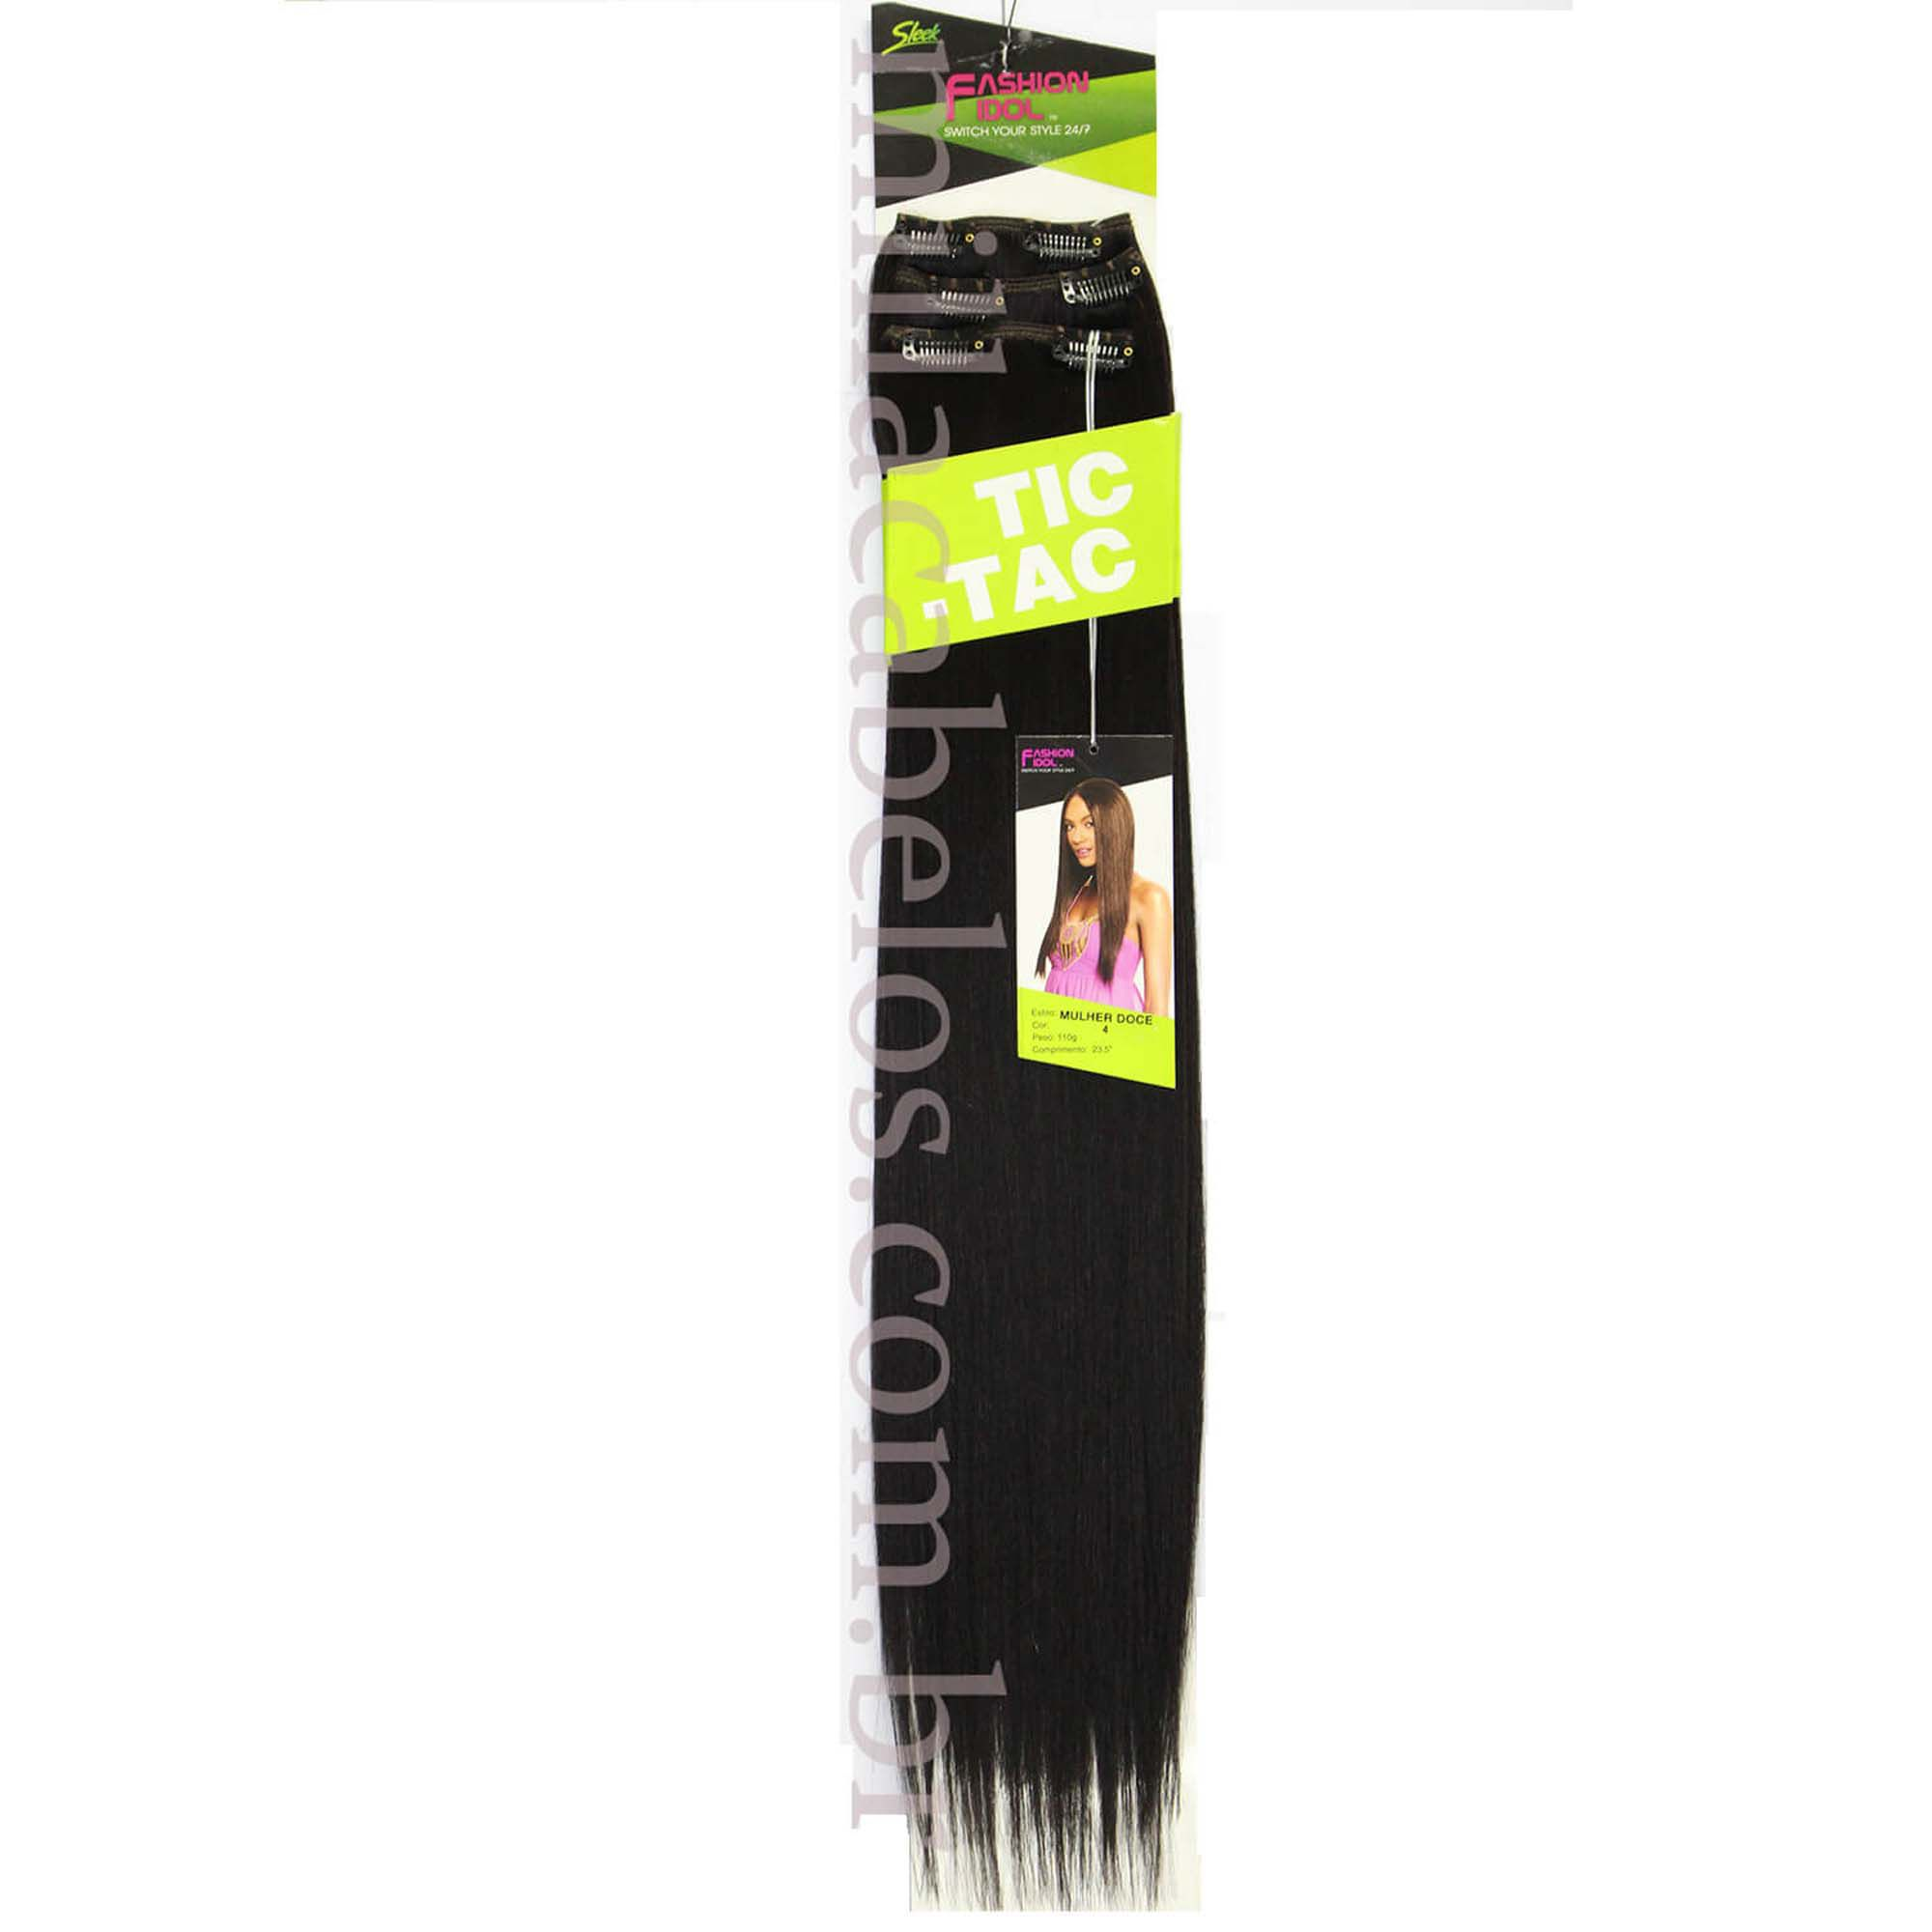 Cabelo Orgânico - Sleek Fashion Idol Tic Tac - Mulher Doce